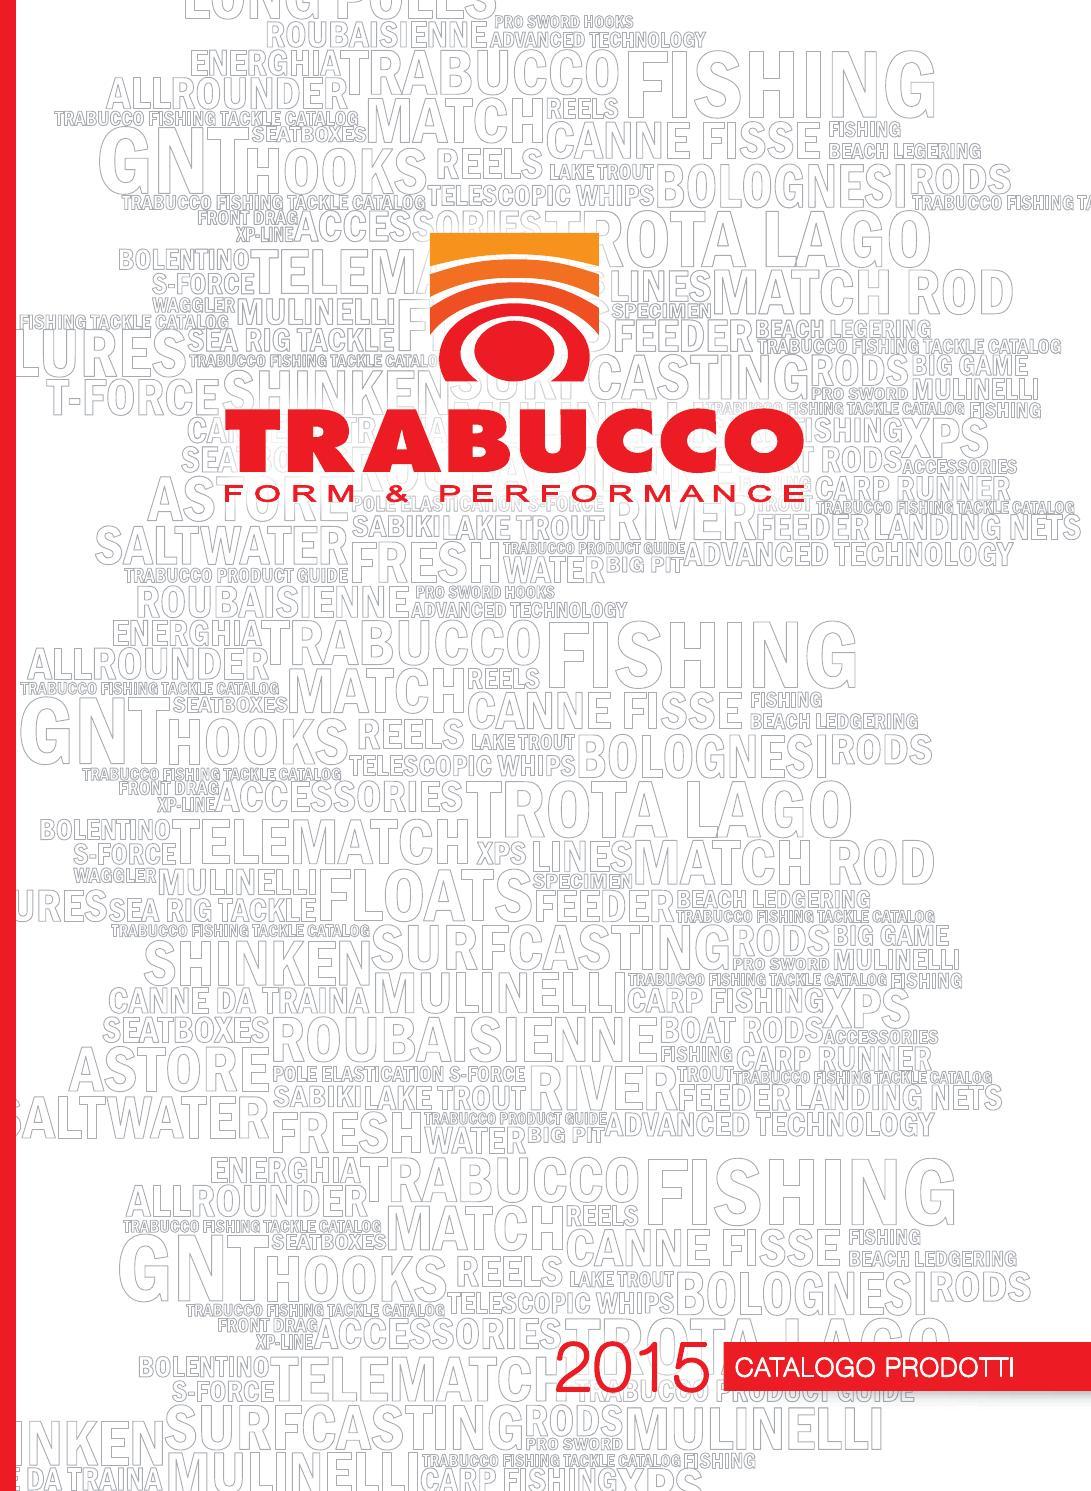 Catalogo trabucco fishing 2015 italia by trabucco fishing for Trabucco arredamenti catalogo